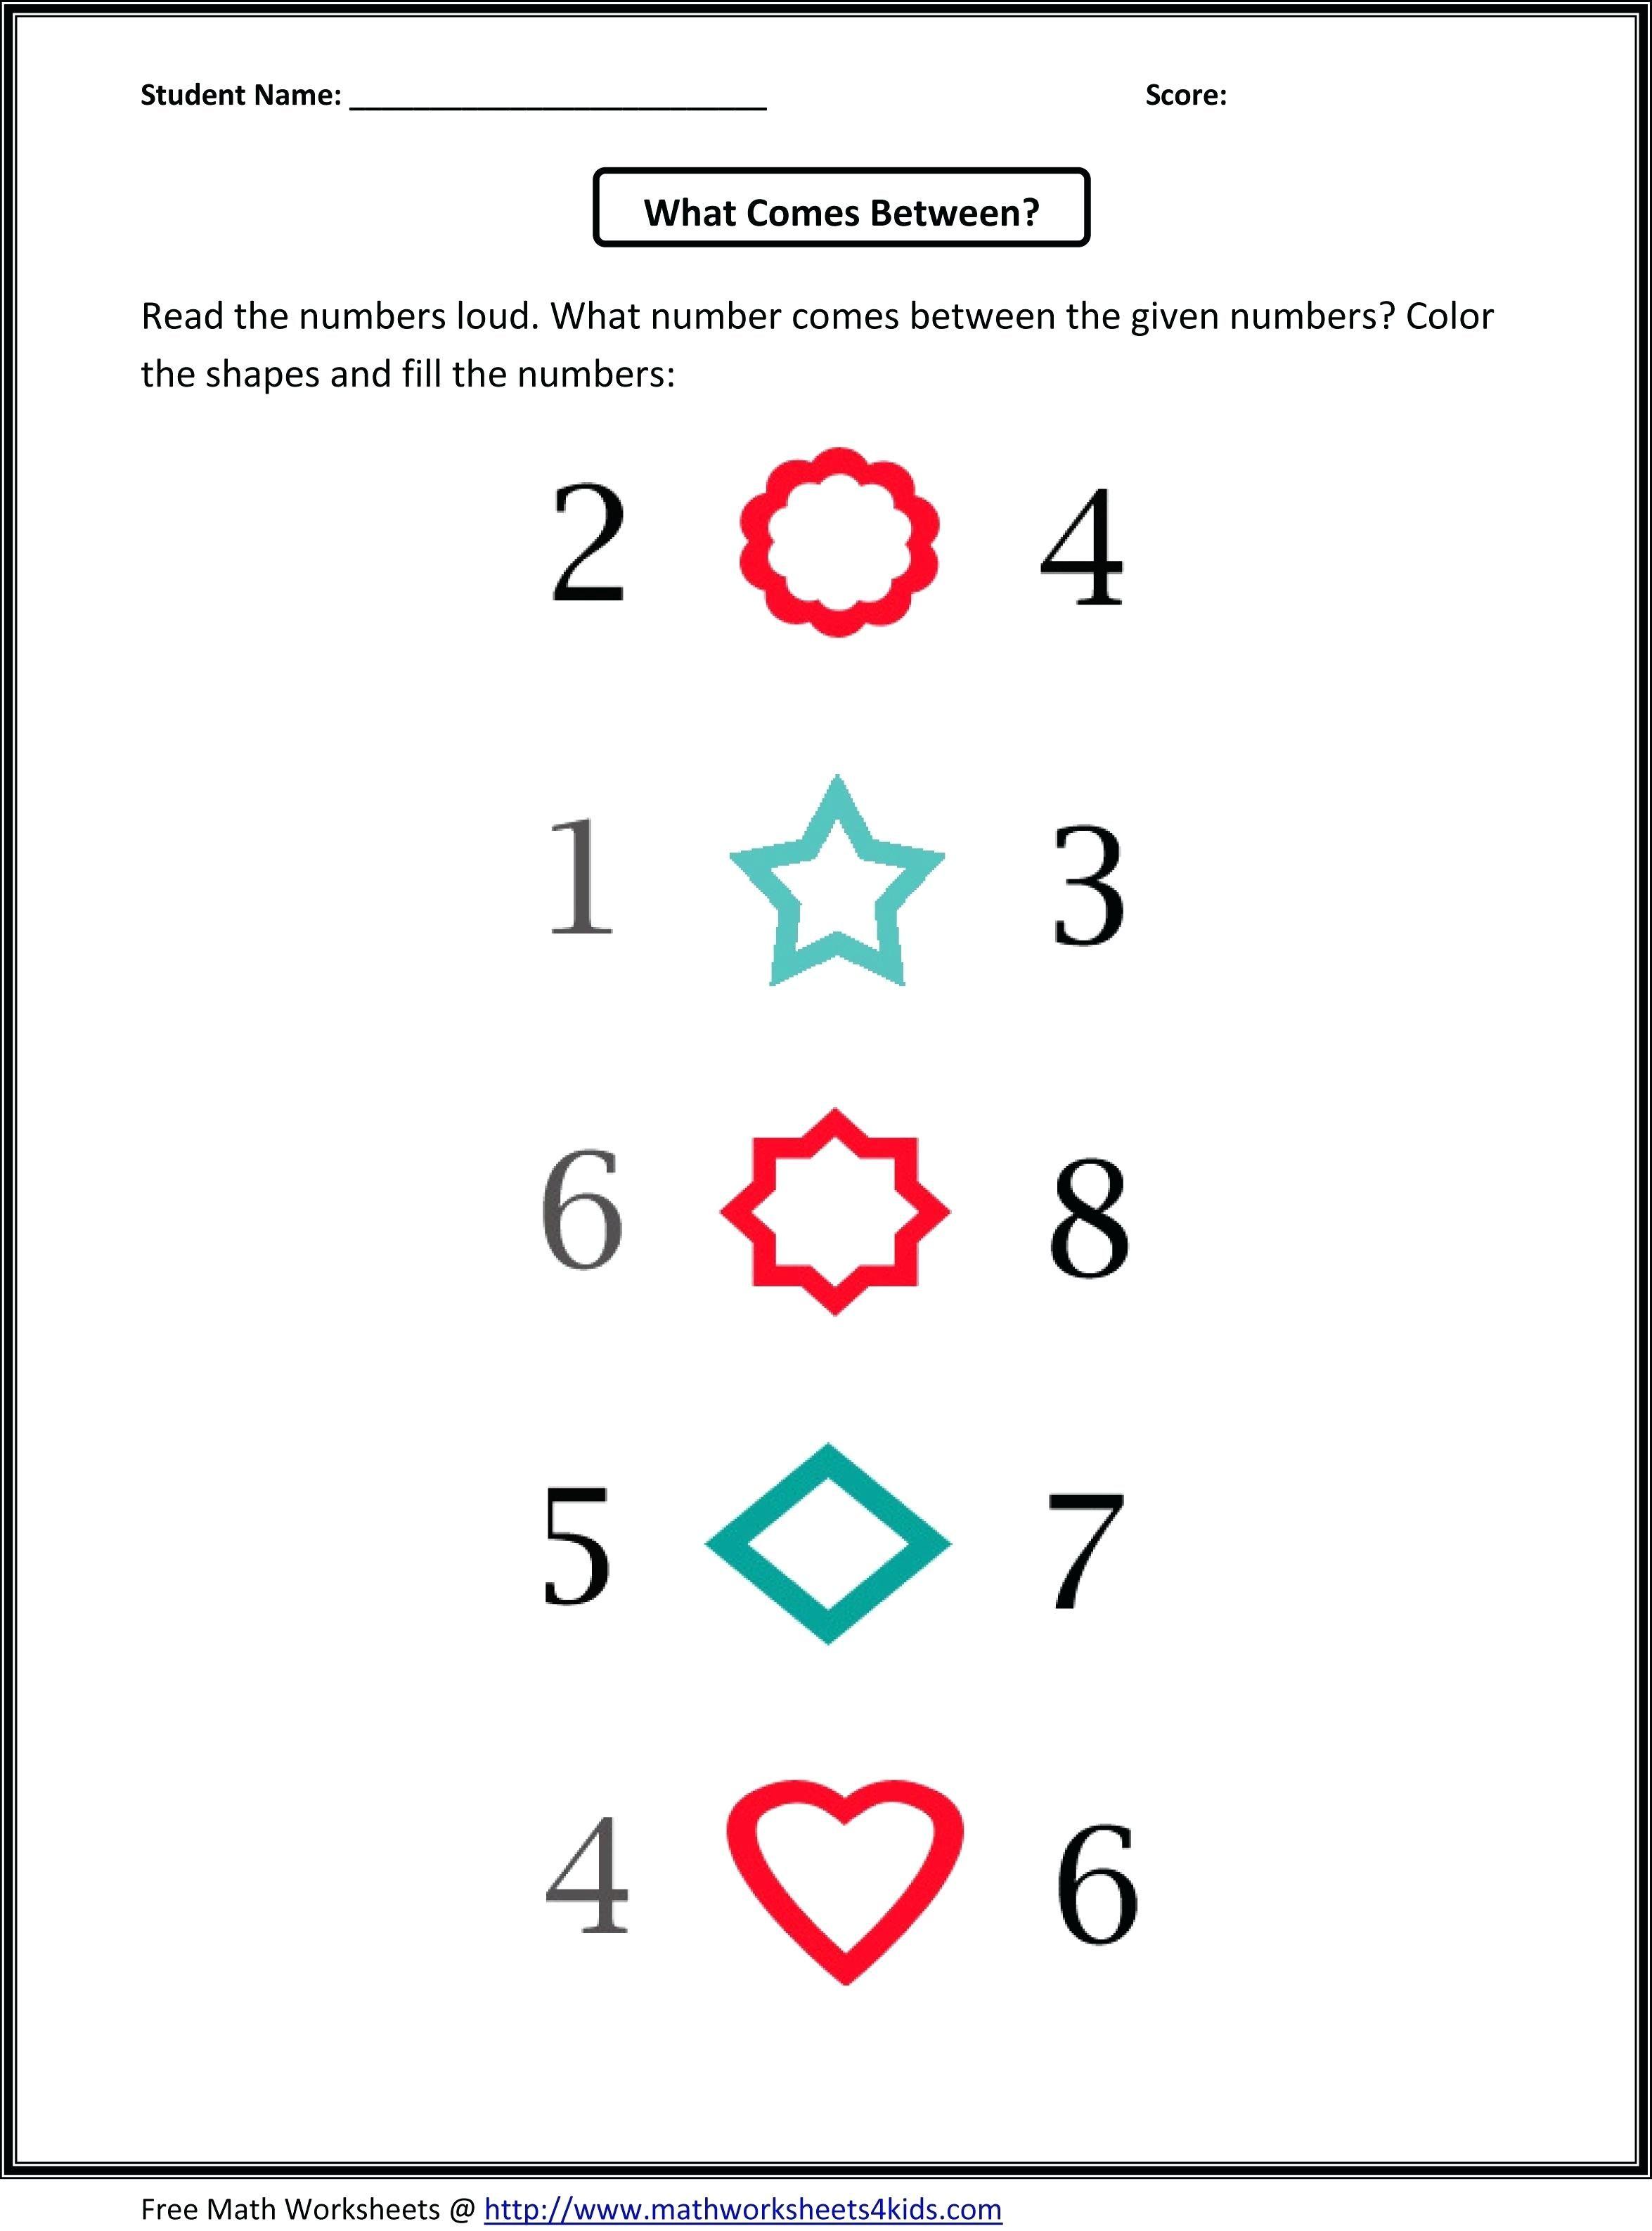 Kindergarten Math Counting Worksheets Free Counting Worksheets For Pattern Worksheets For Kindergarten Kindergarten Worksheets Math Worksheets [ 3174 x 2350 Pixel ]